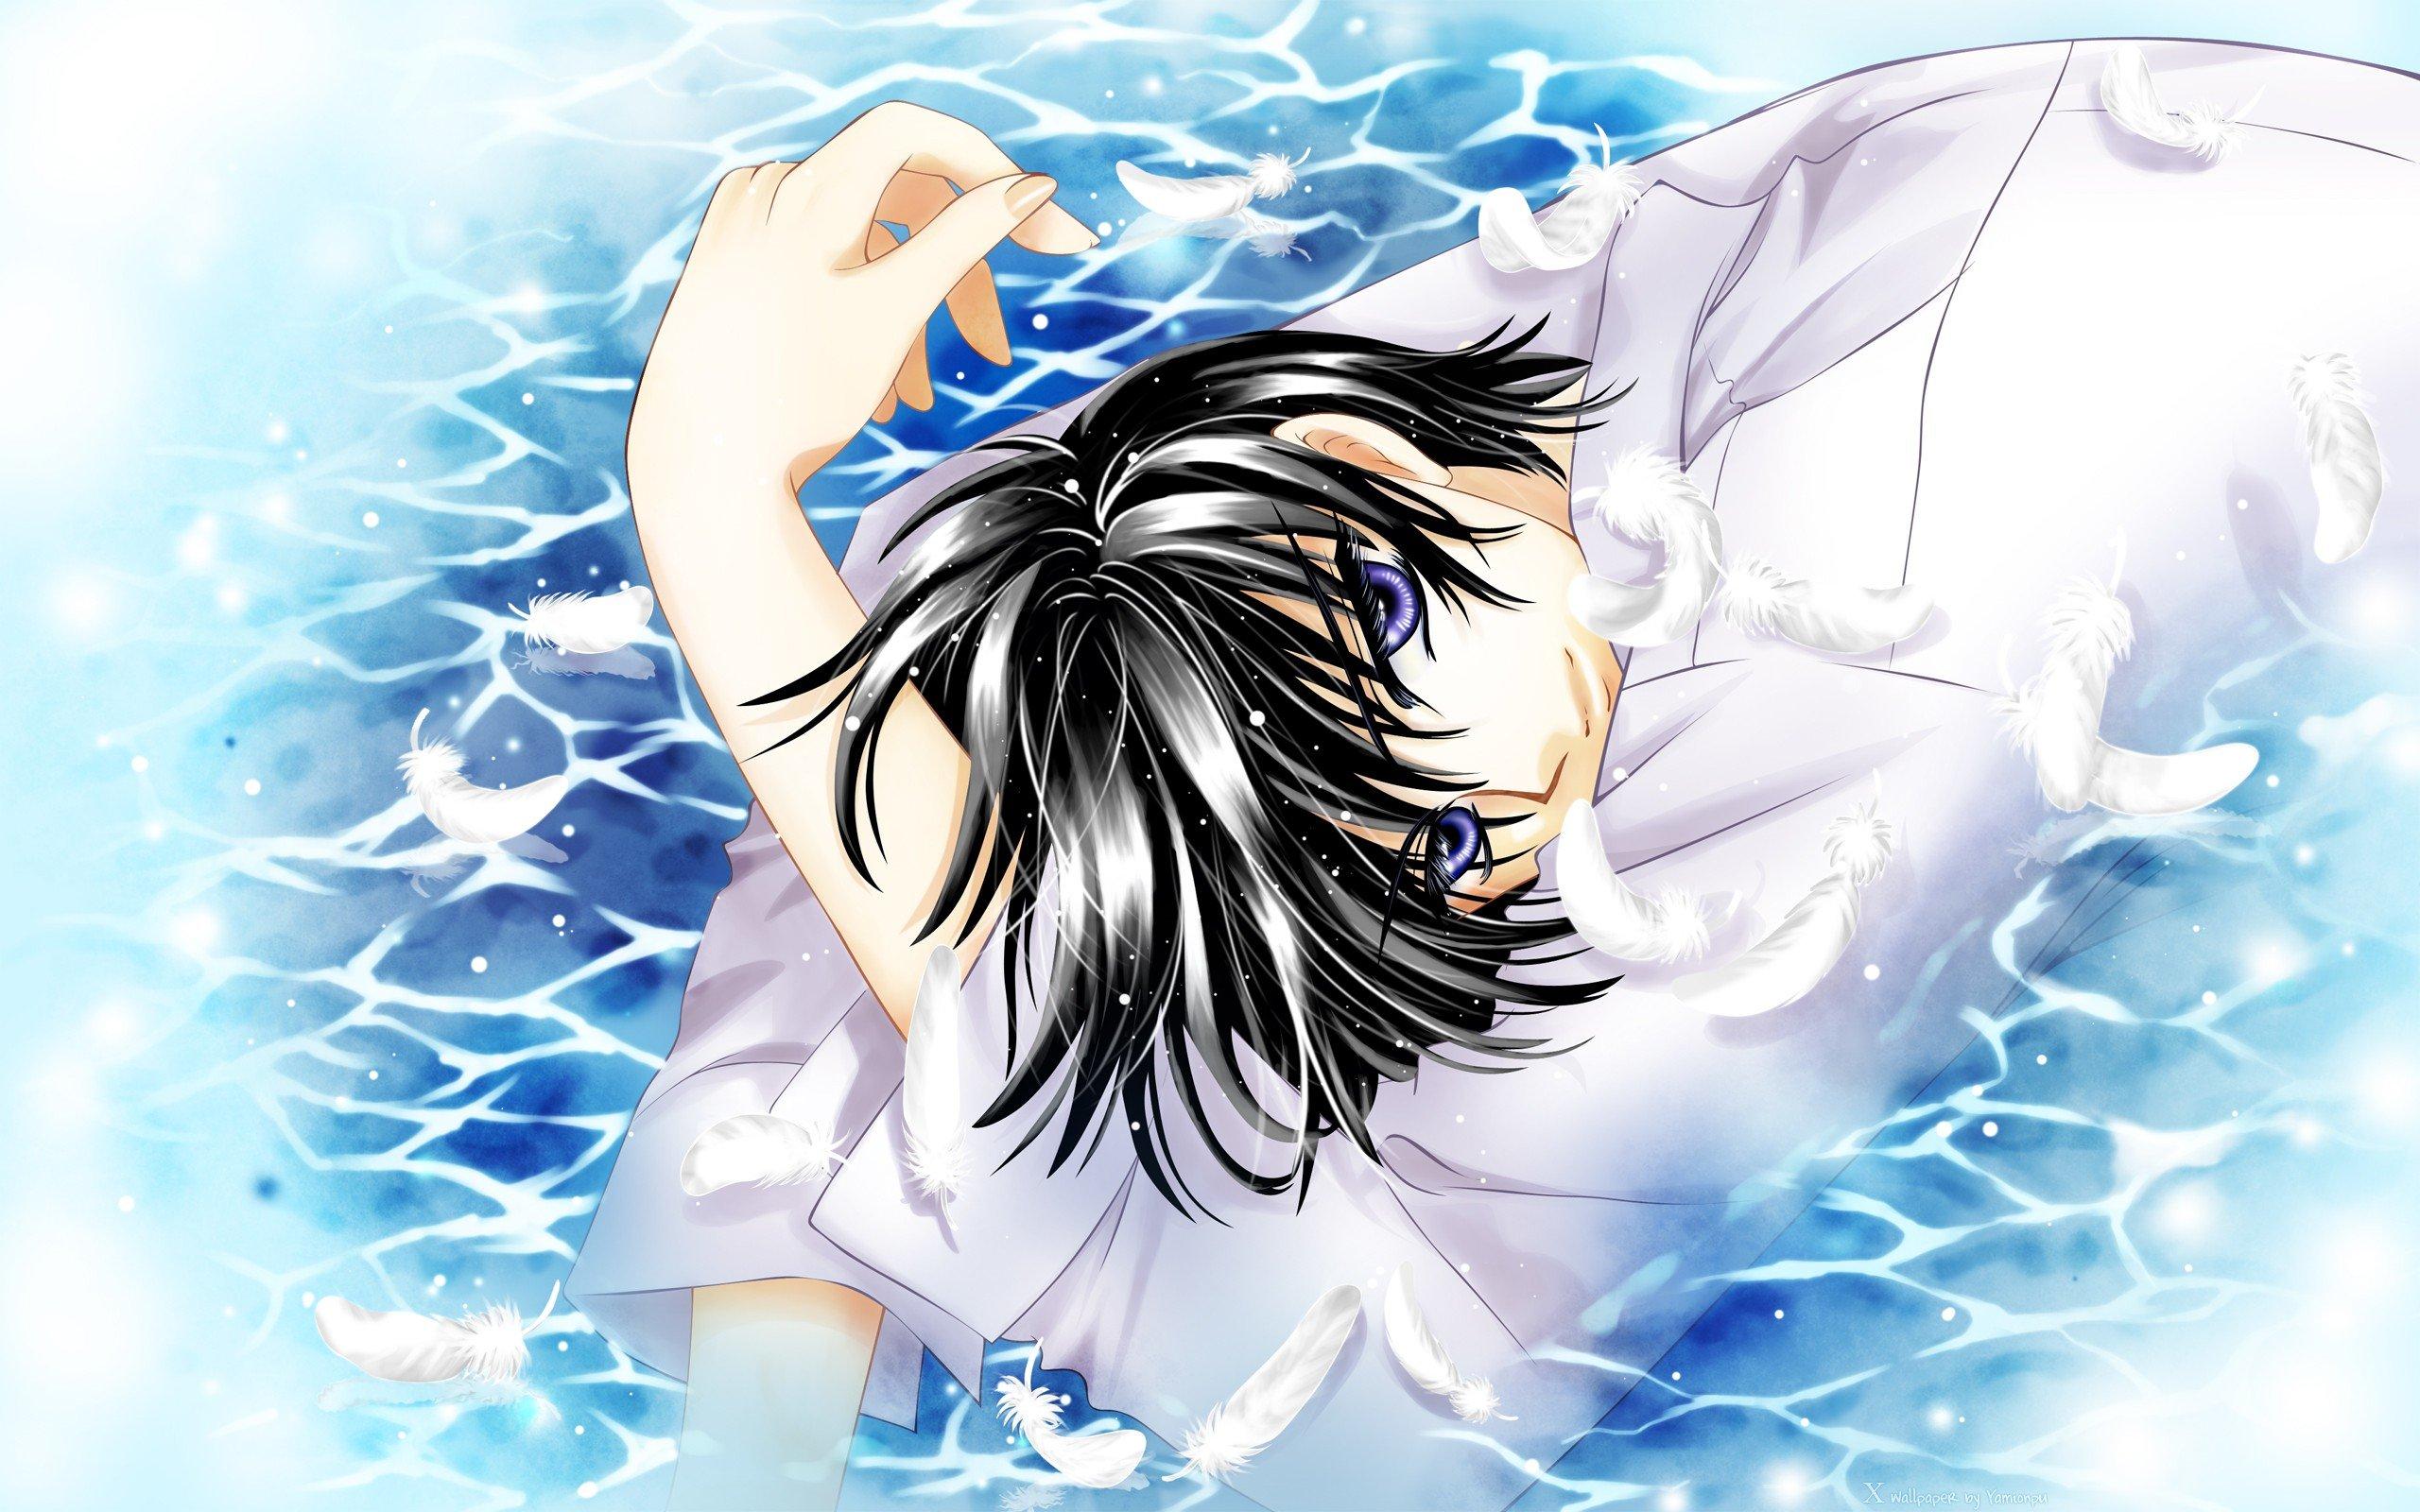 Water Wings Blue Eyes Anime Anime Boys Clamp Black Hair Kamui Shirou